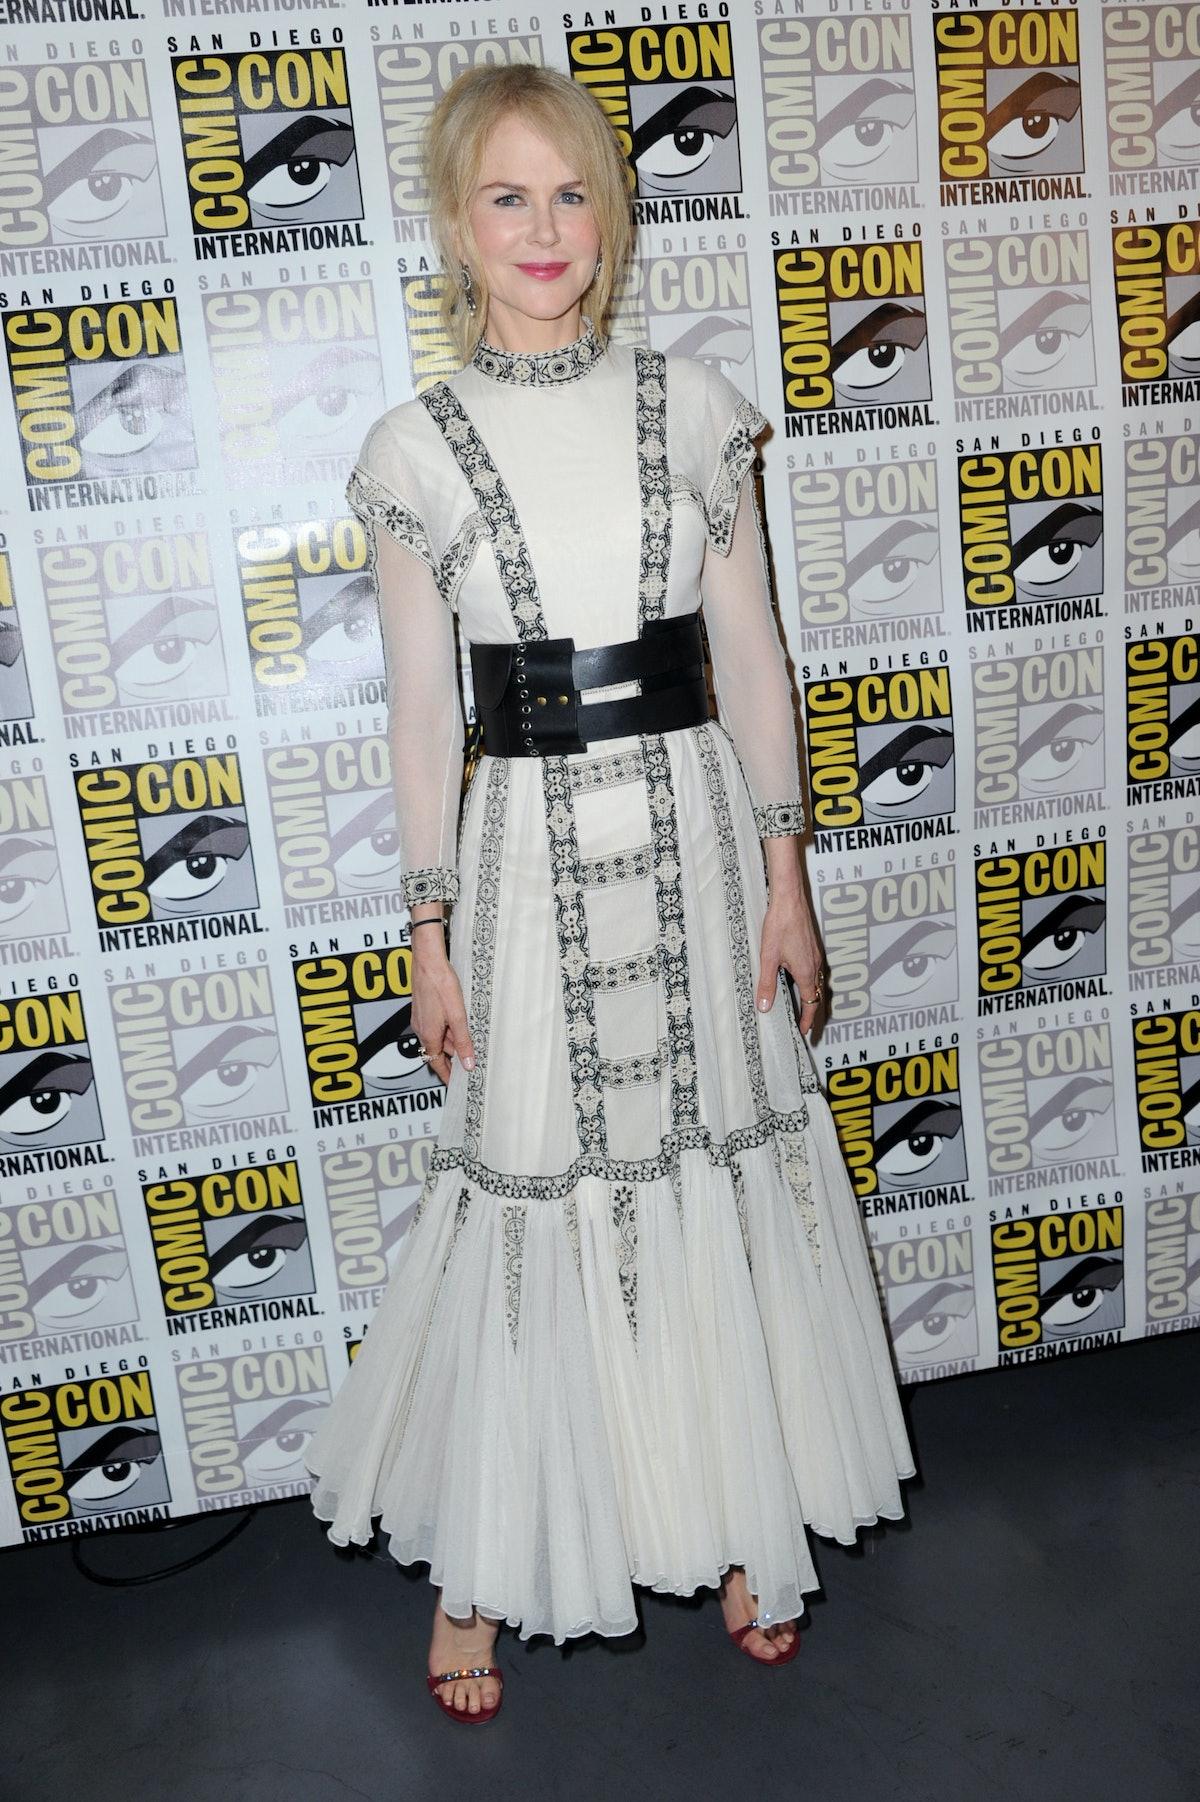 Comic-Con International 2018 - Warner Bros. Theatrical Panel